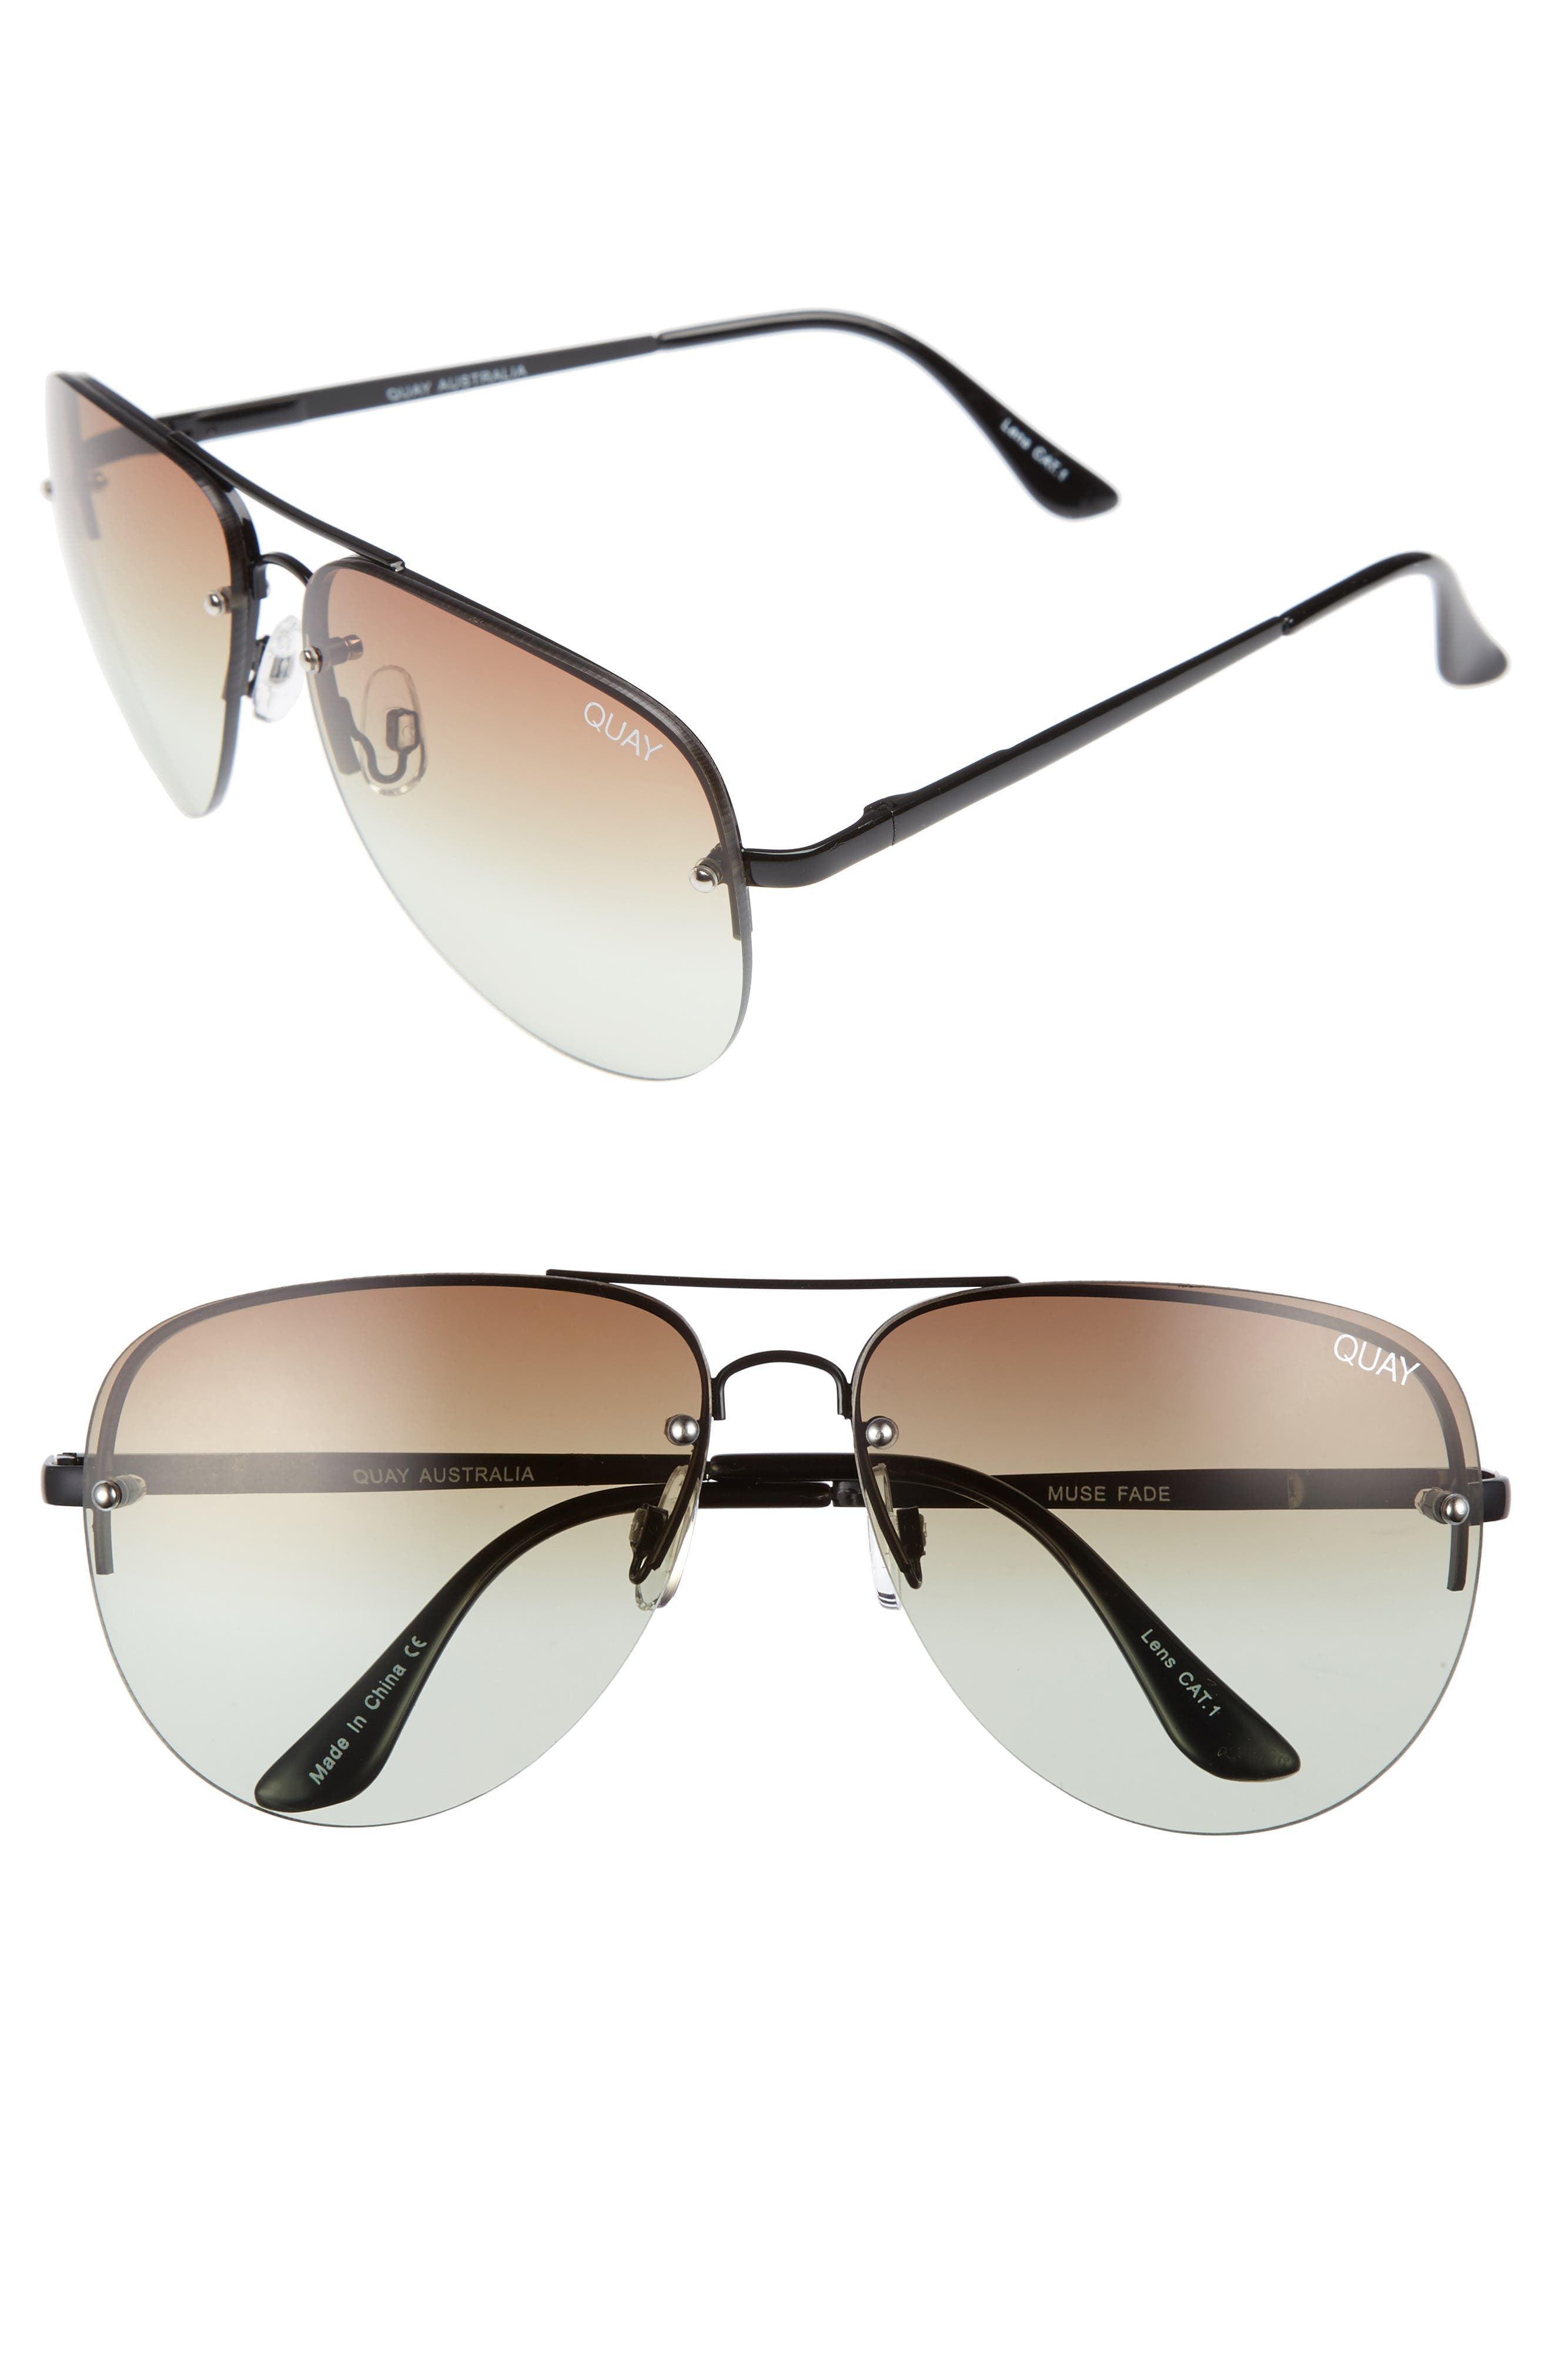 Alternate Image 1 Selected - Quay Australia Muse Fade 62mm Aviator Sunglasses